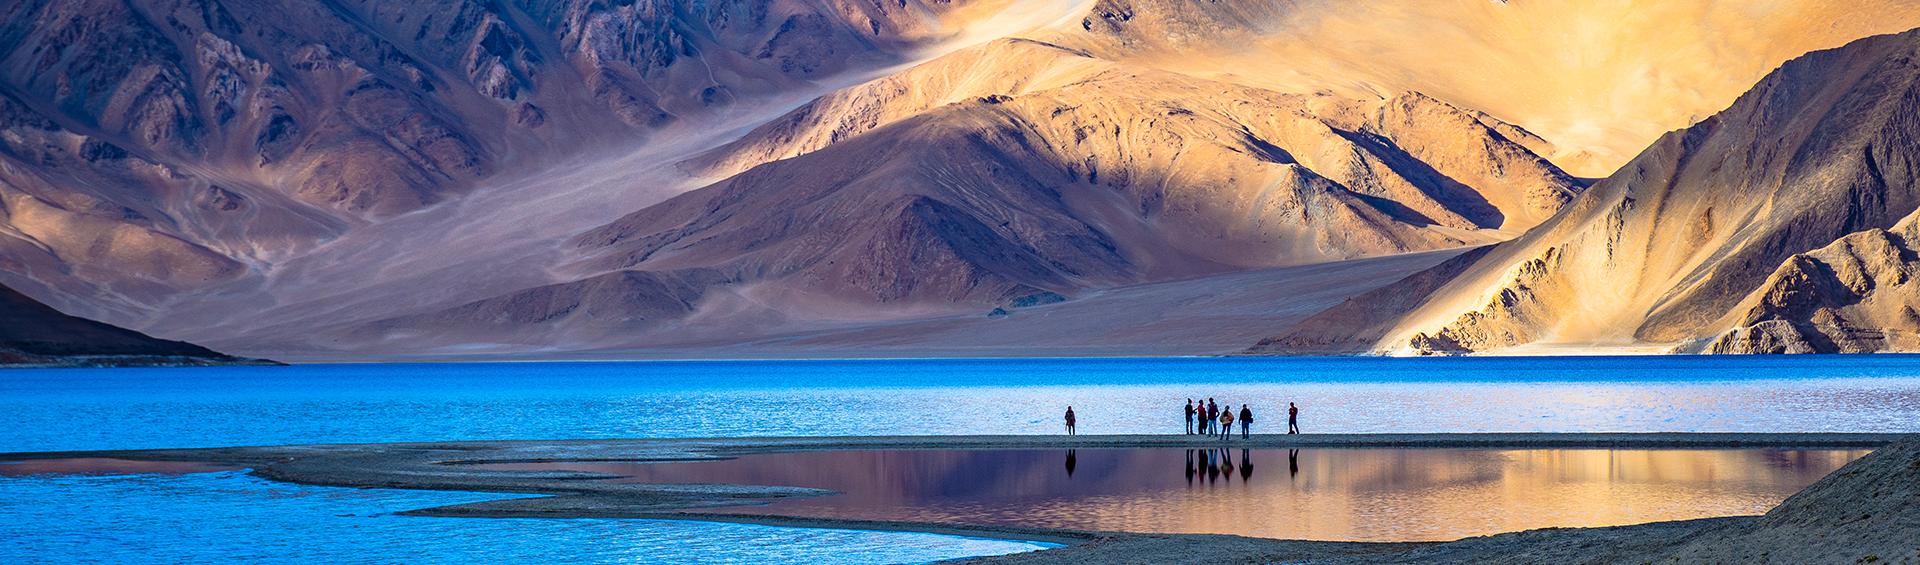 Inde, Ladakh, Leh, Montagne, Lake